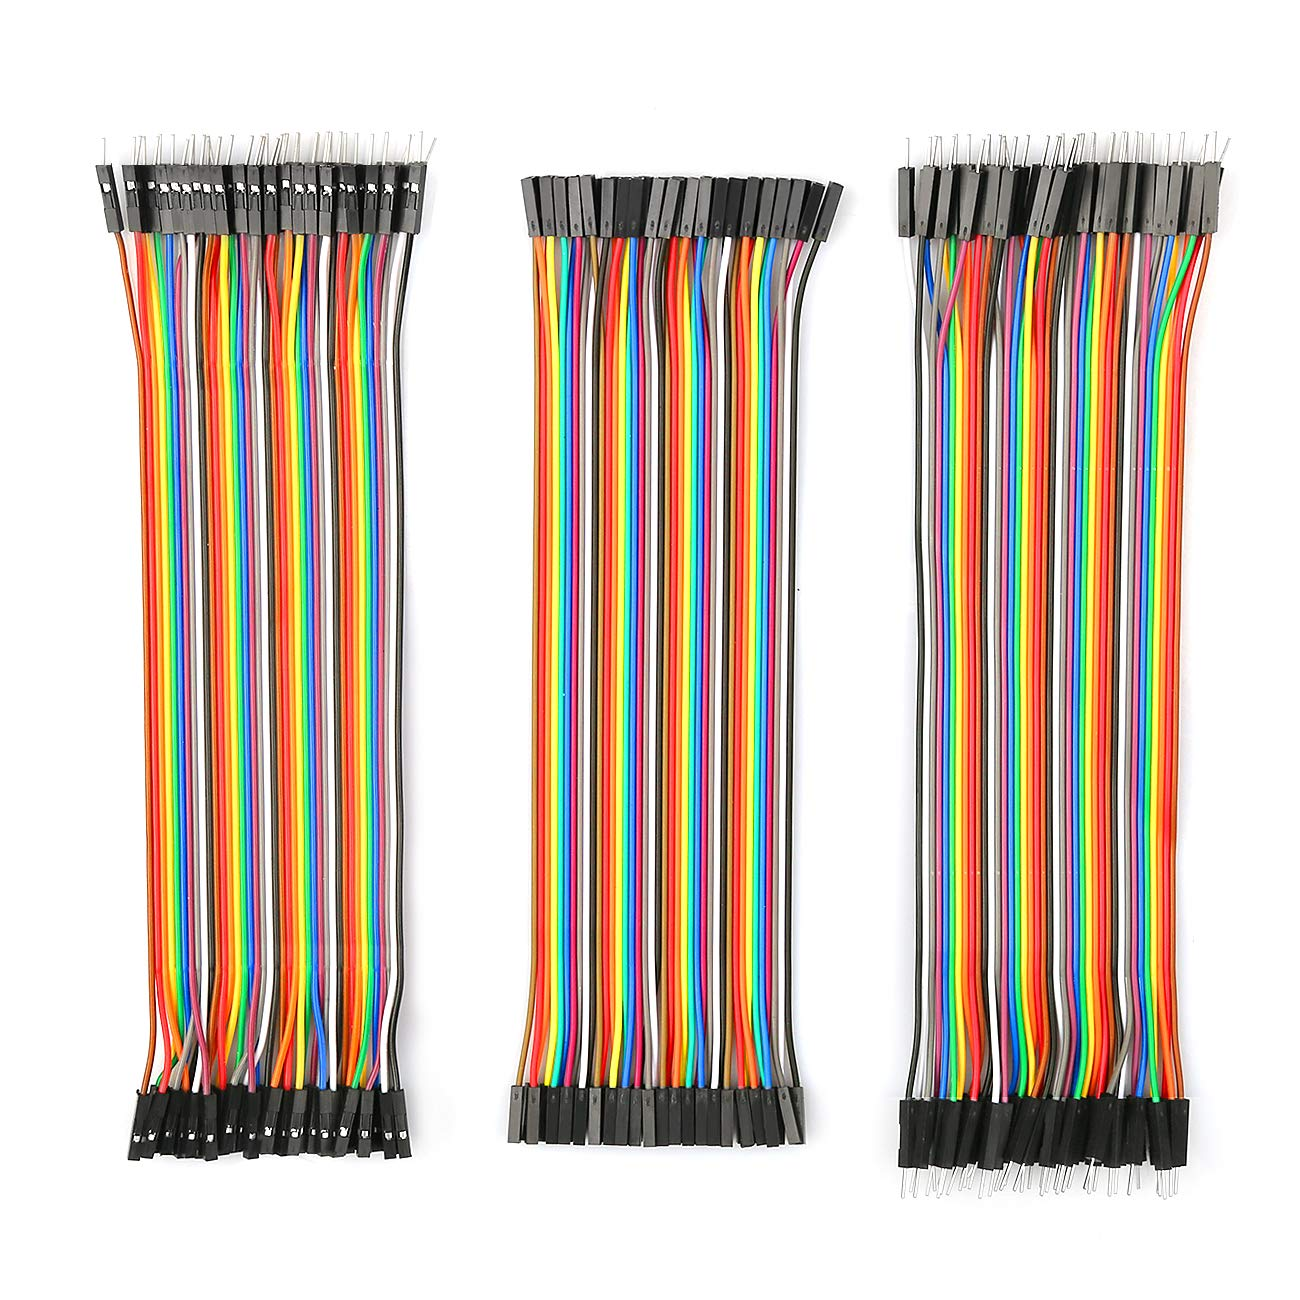 40pin Stecker zu Male HAUSPROFI 3 Set Standard Jumper Wires Plus 3 Set L/ötfreie Prototype Breadboard 830 Tie Points Breadboard 40pin Female zu Female 20cm Dr/ähte Dupont Kabel 40pin Male zu Female